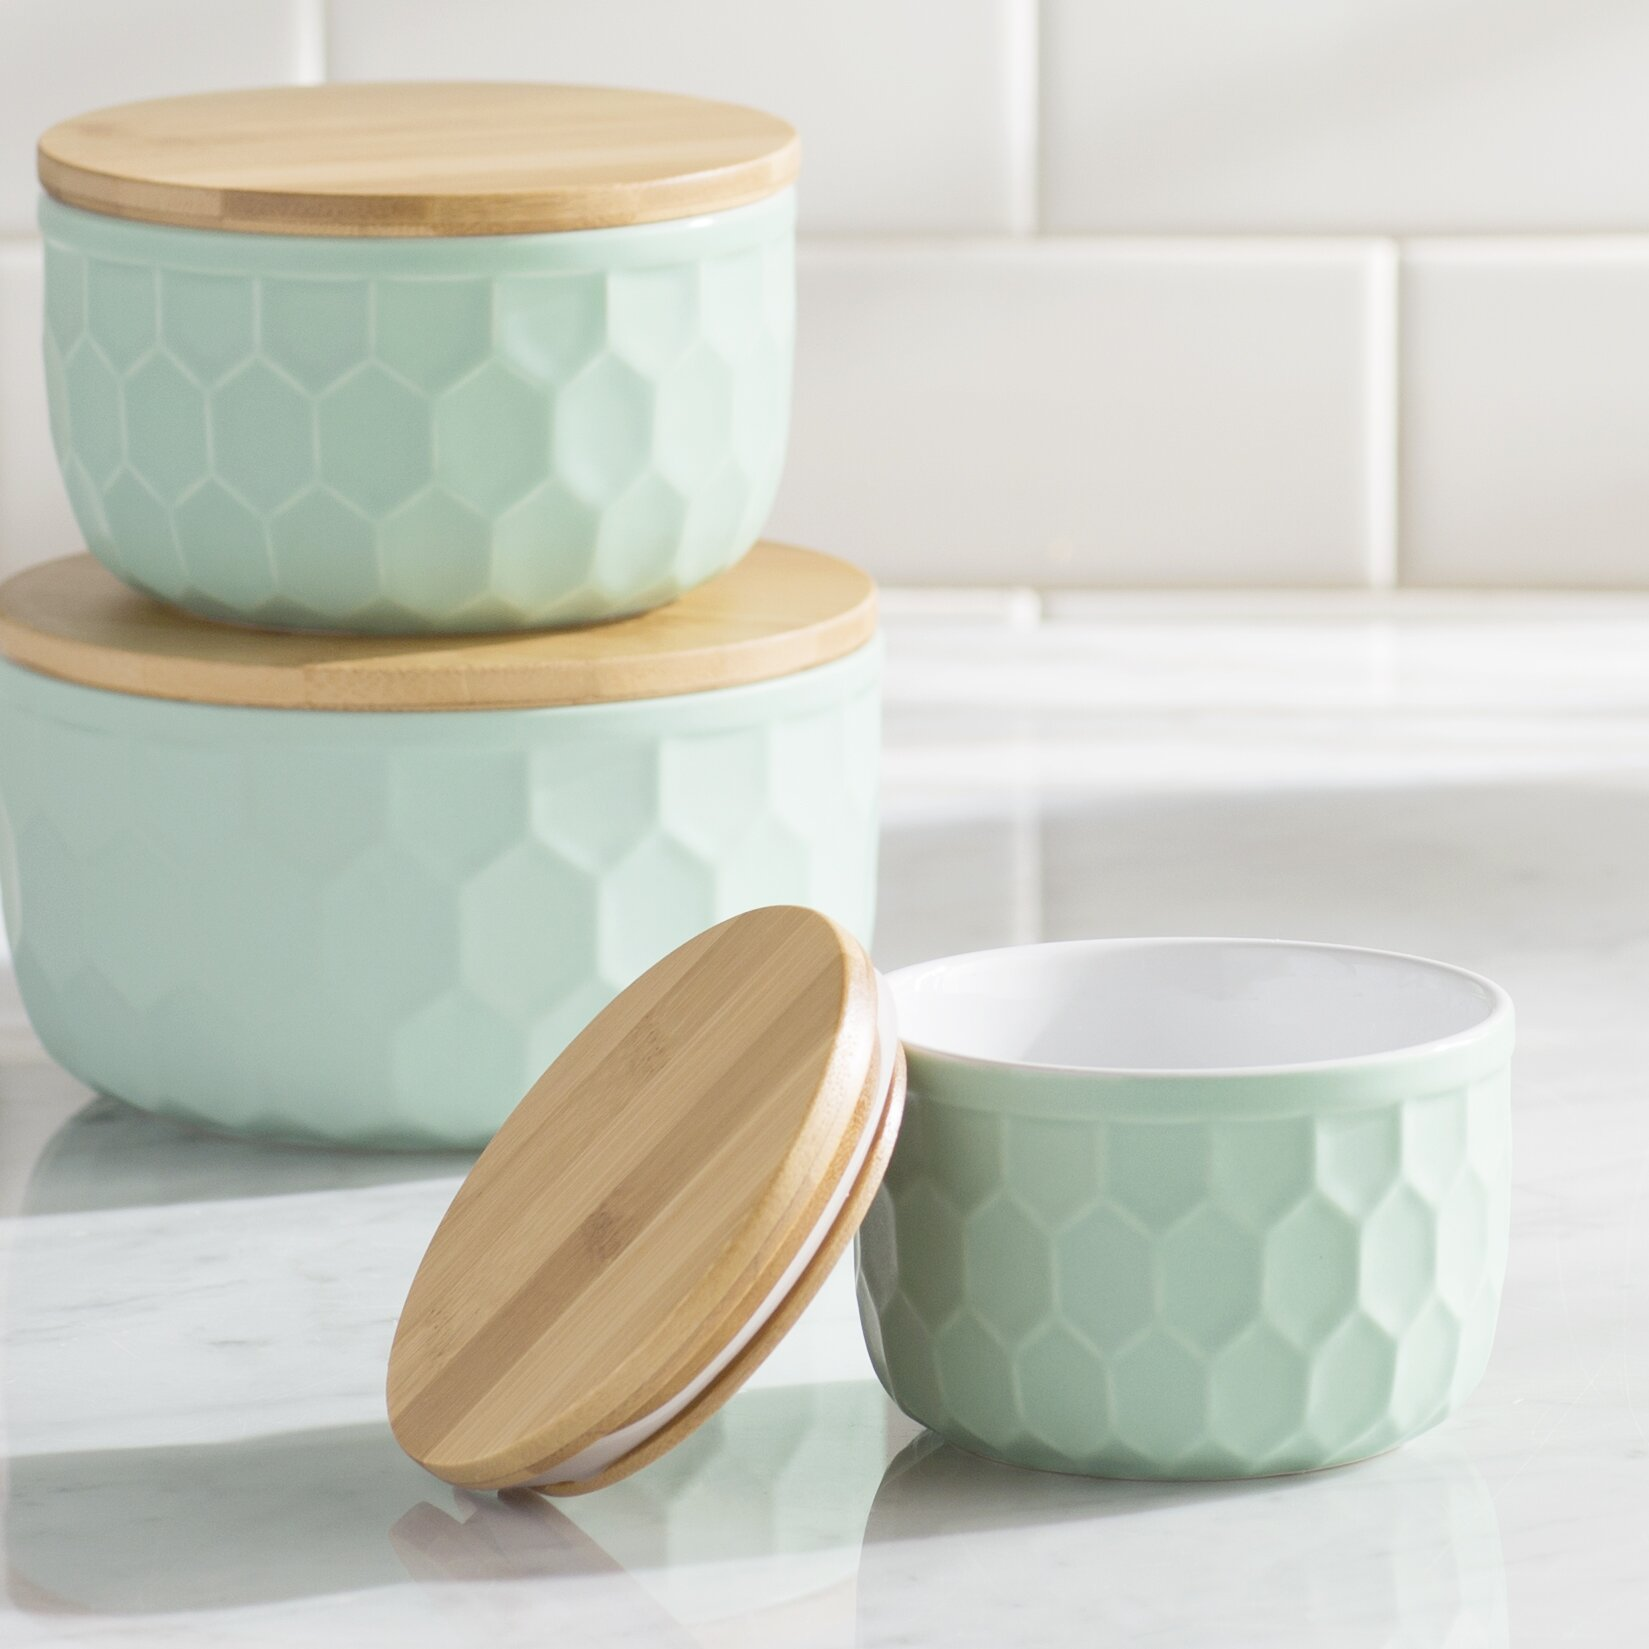 mint pantry bergamot 3 piece ceramic mixing bowl set reviews wayfair. Black Bedroom Furniture Sets. Home Design Ideas